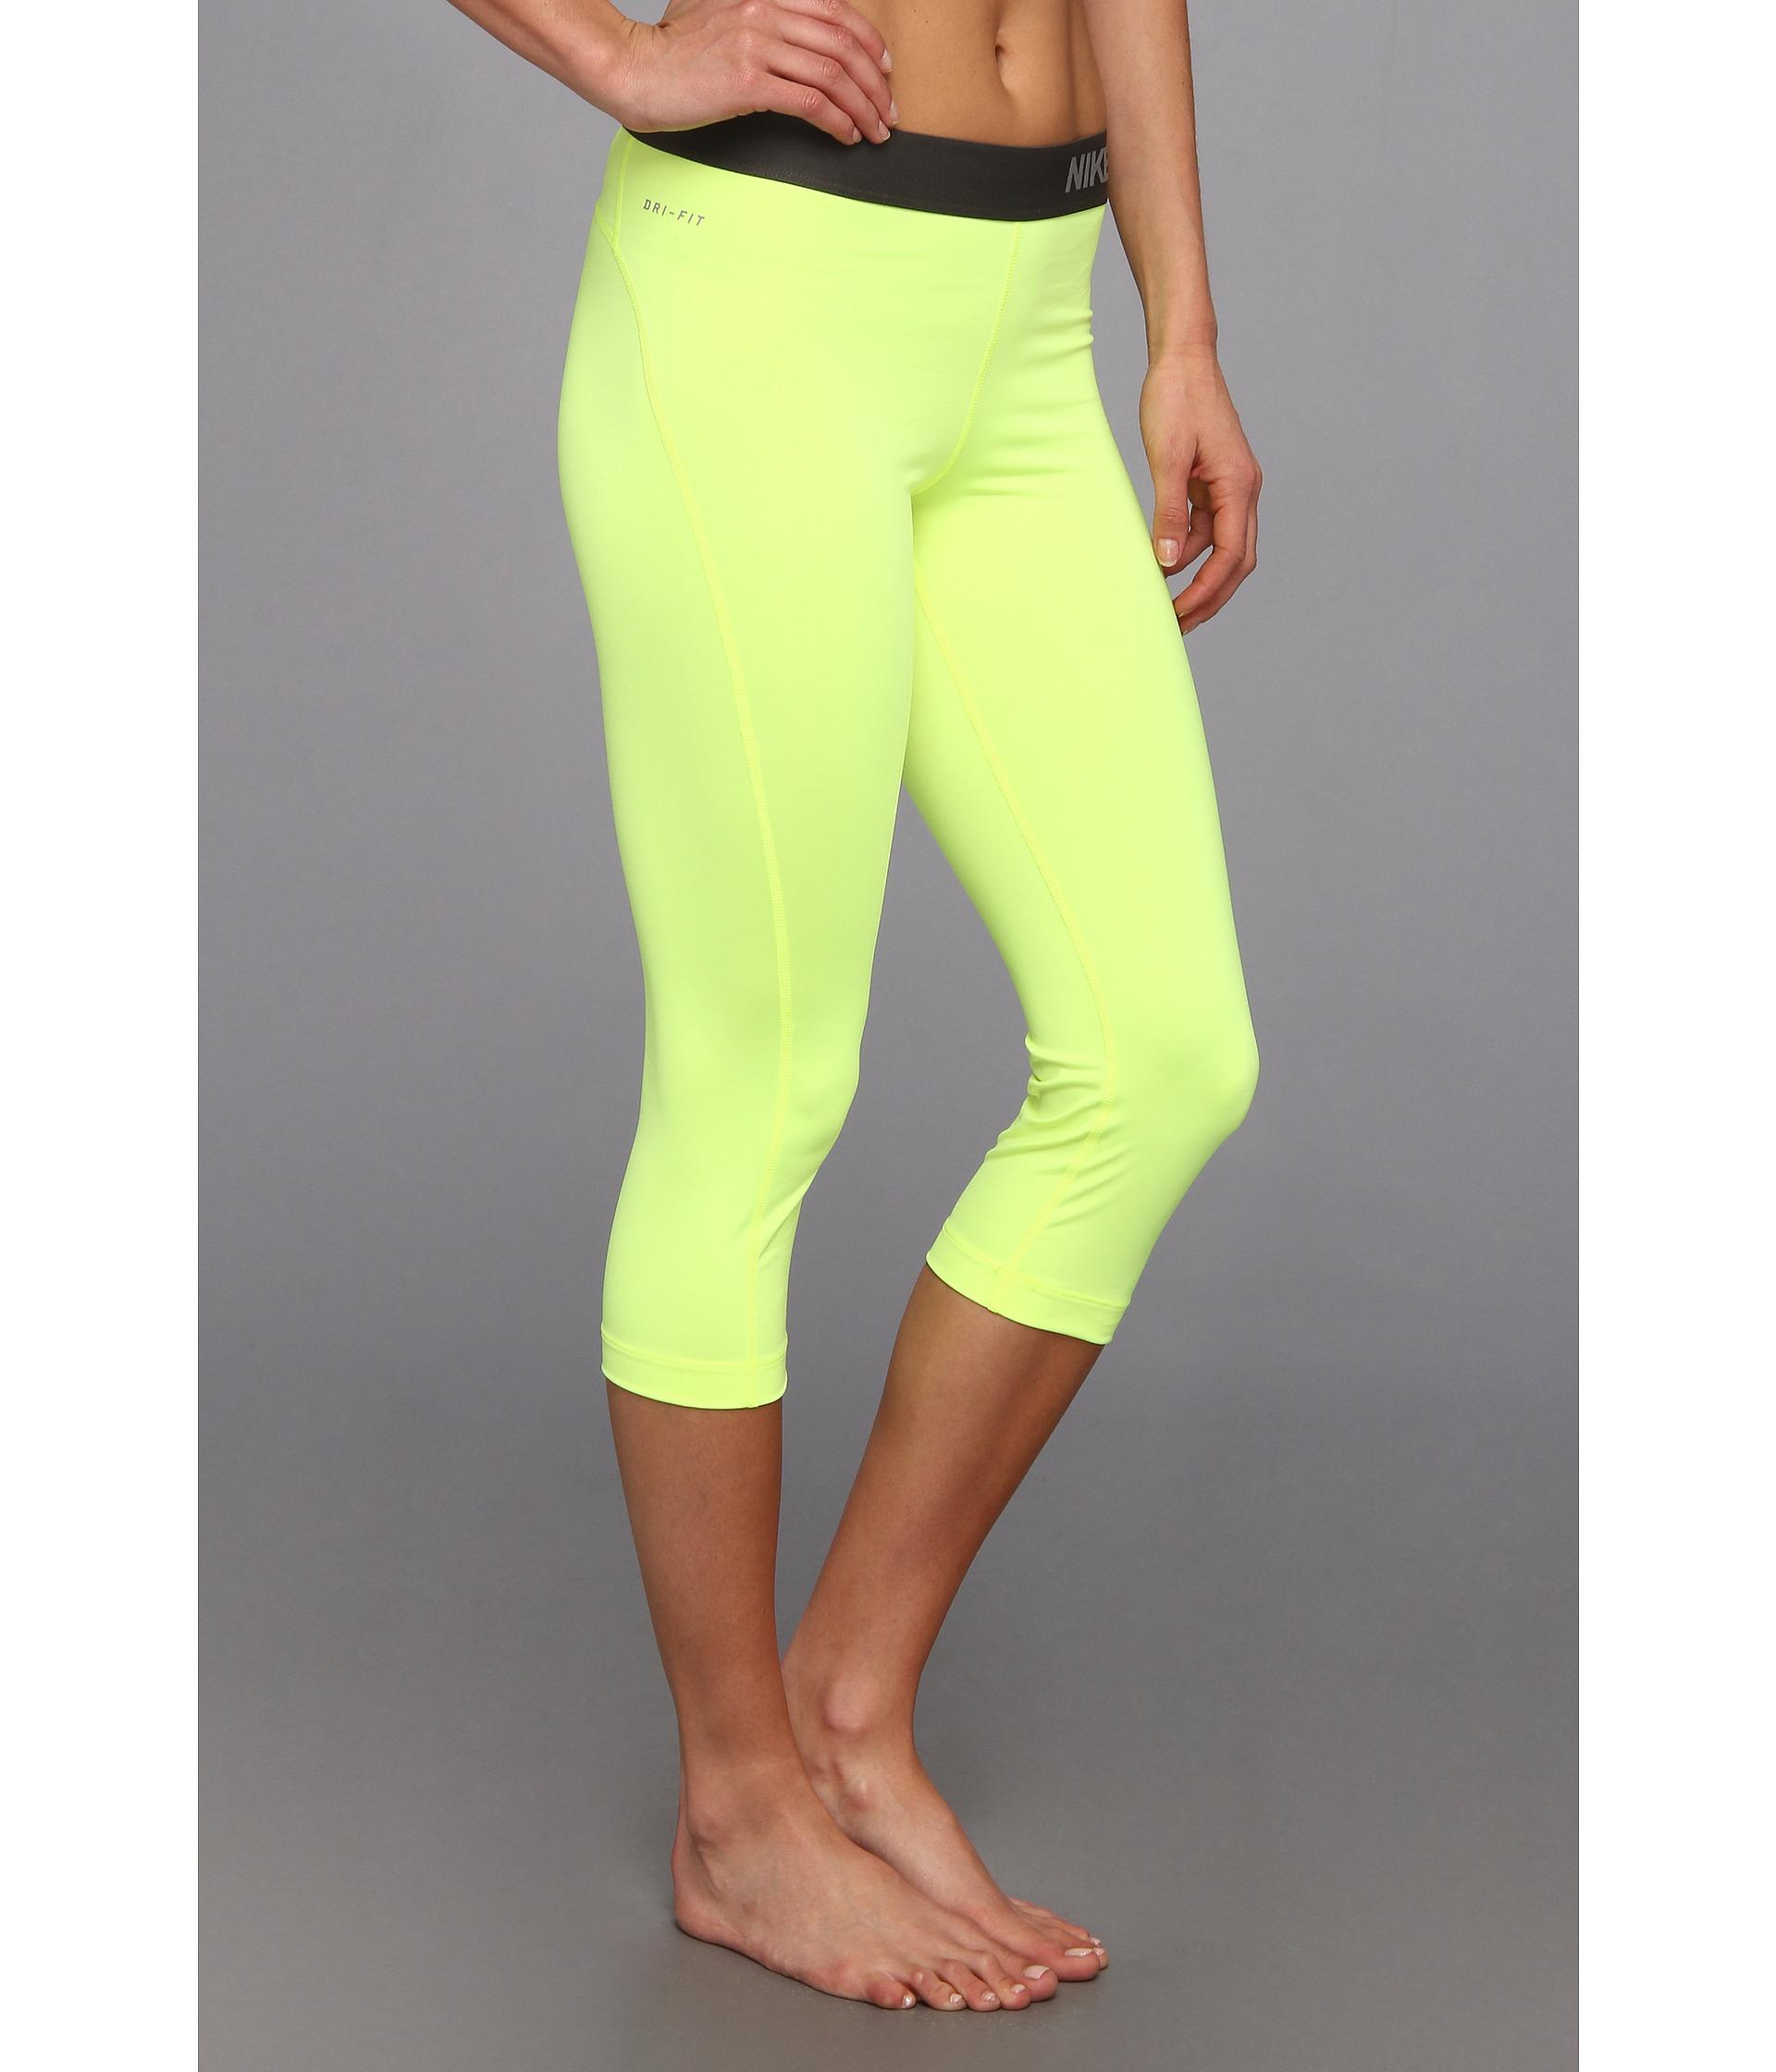 2a1eb47efd1b Lyst - Nike Pro Capri in Yellow